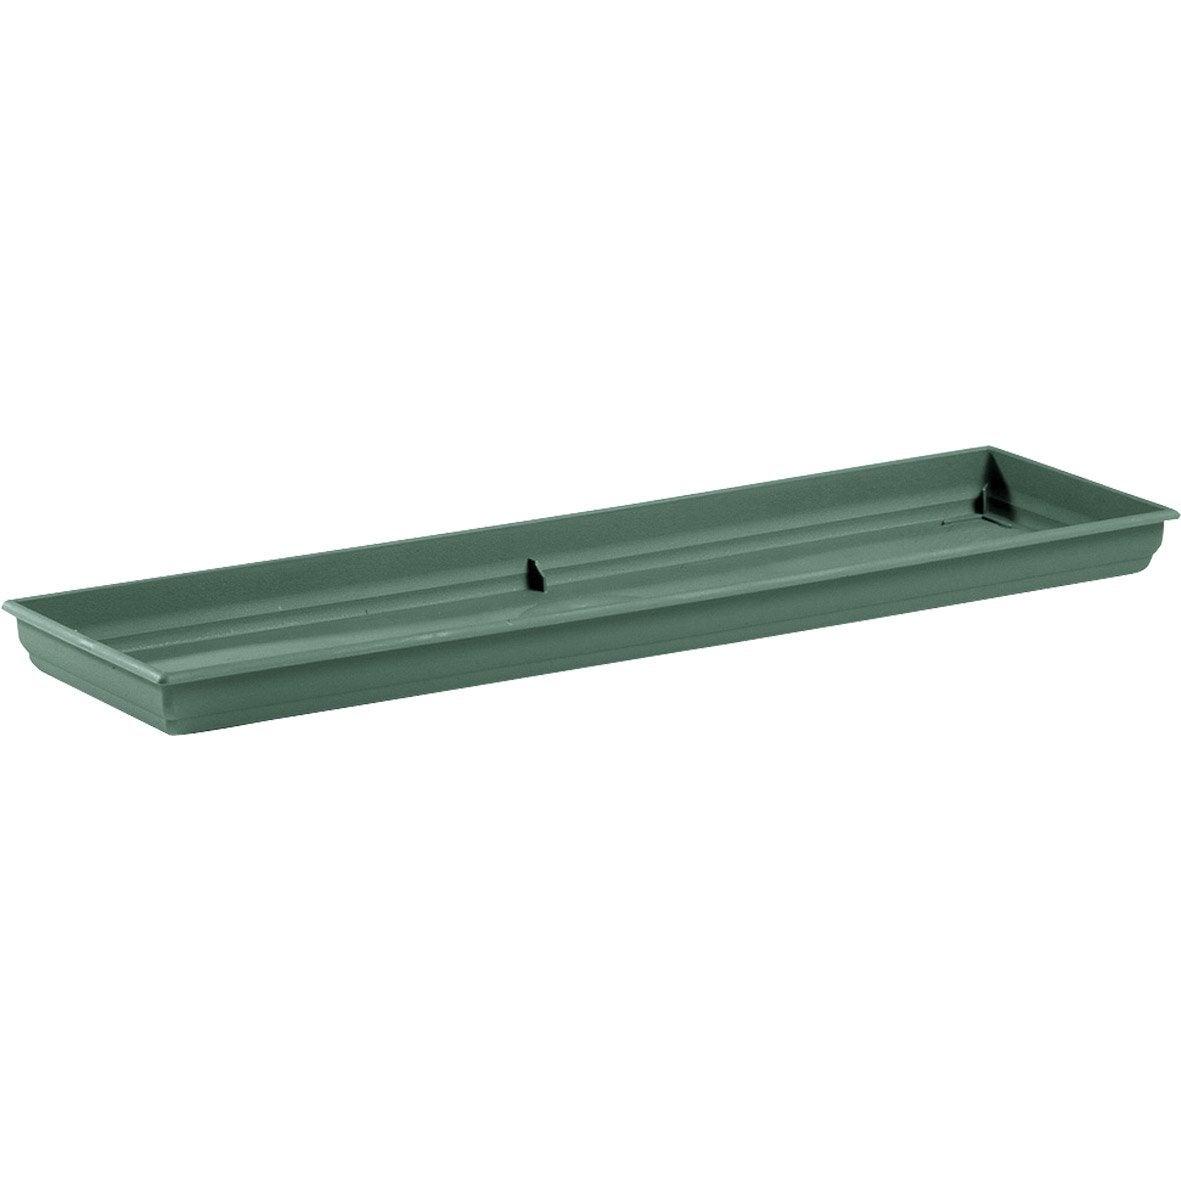 plateau en plastique grosfillex l 55 x l 20 cm vert. Black Bedroom Furniture Sets. Home Design Ideas